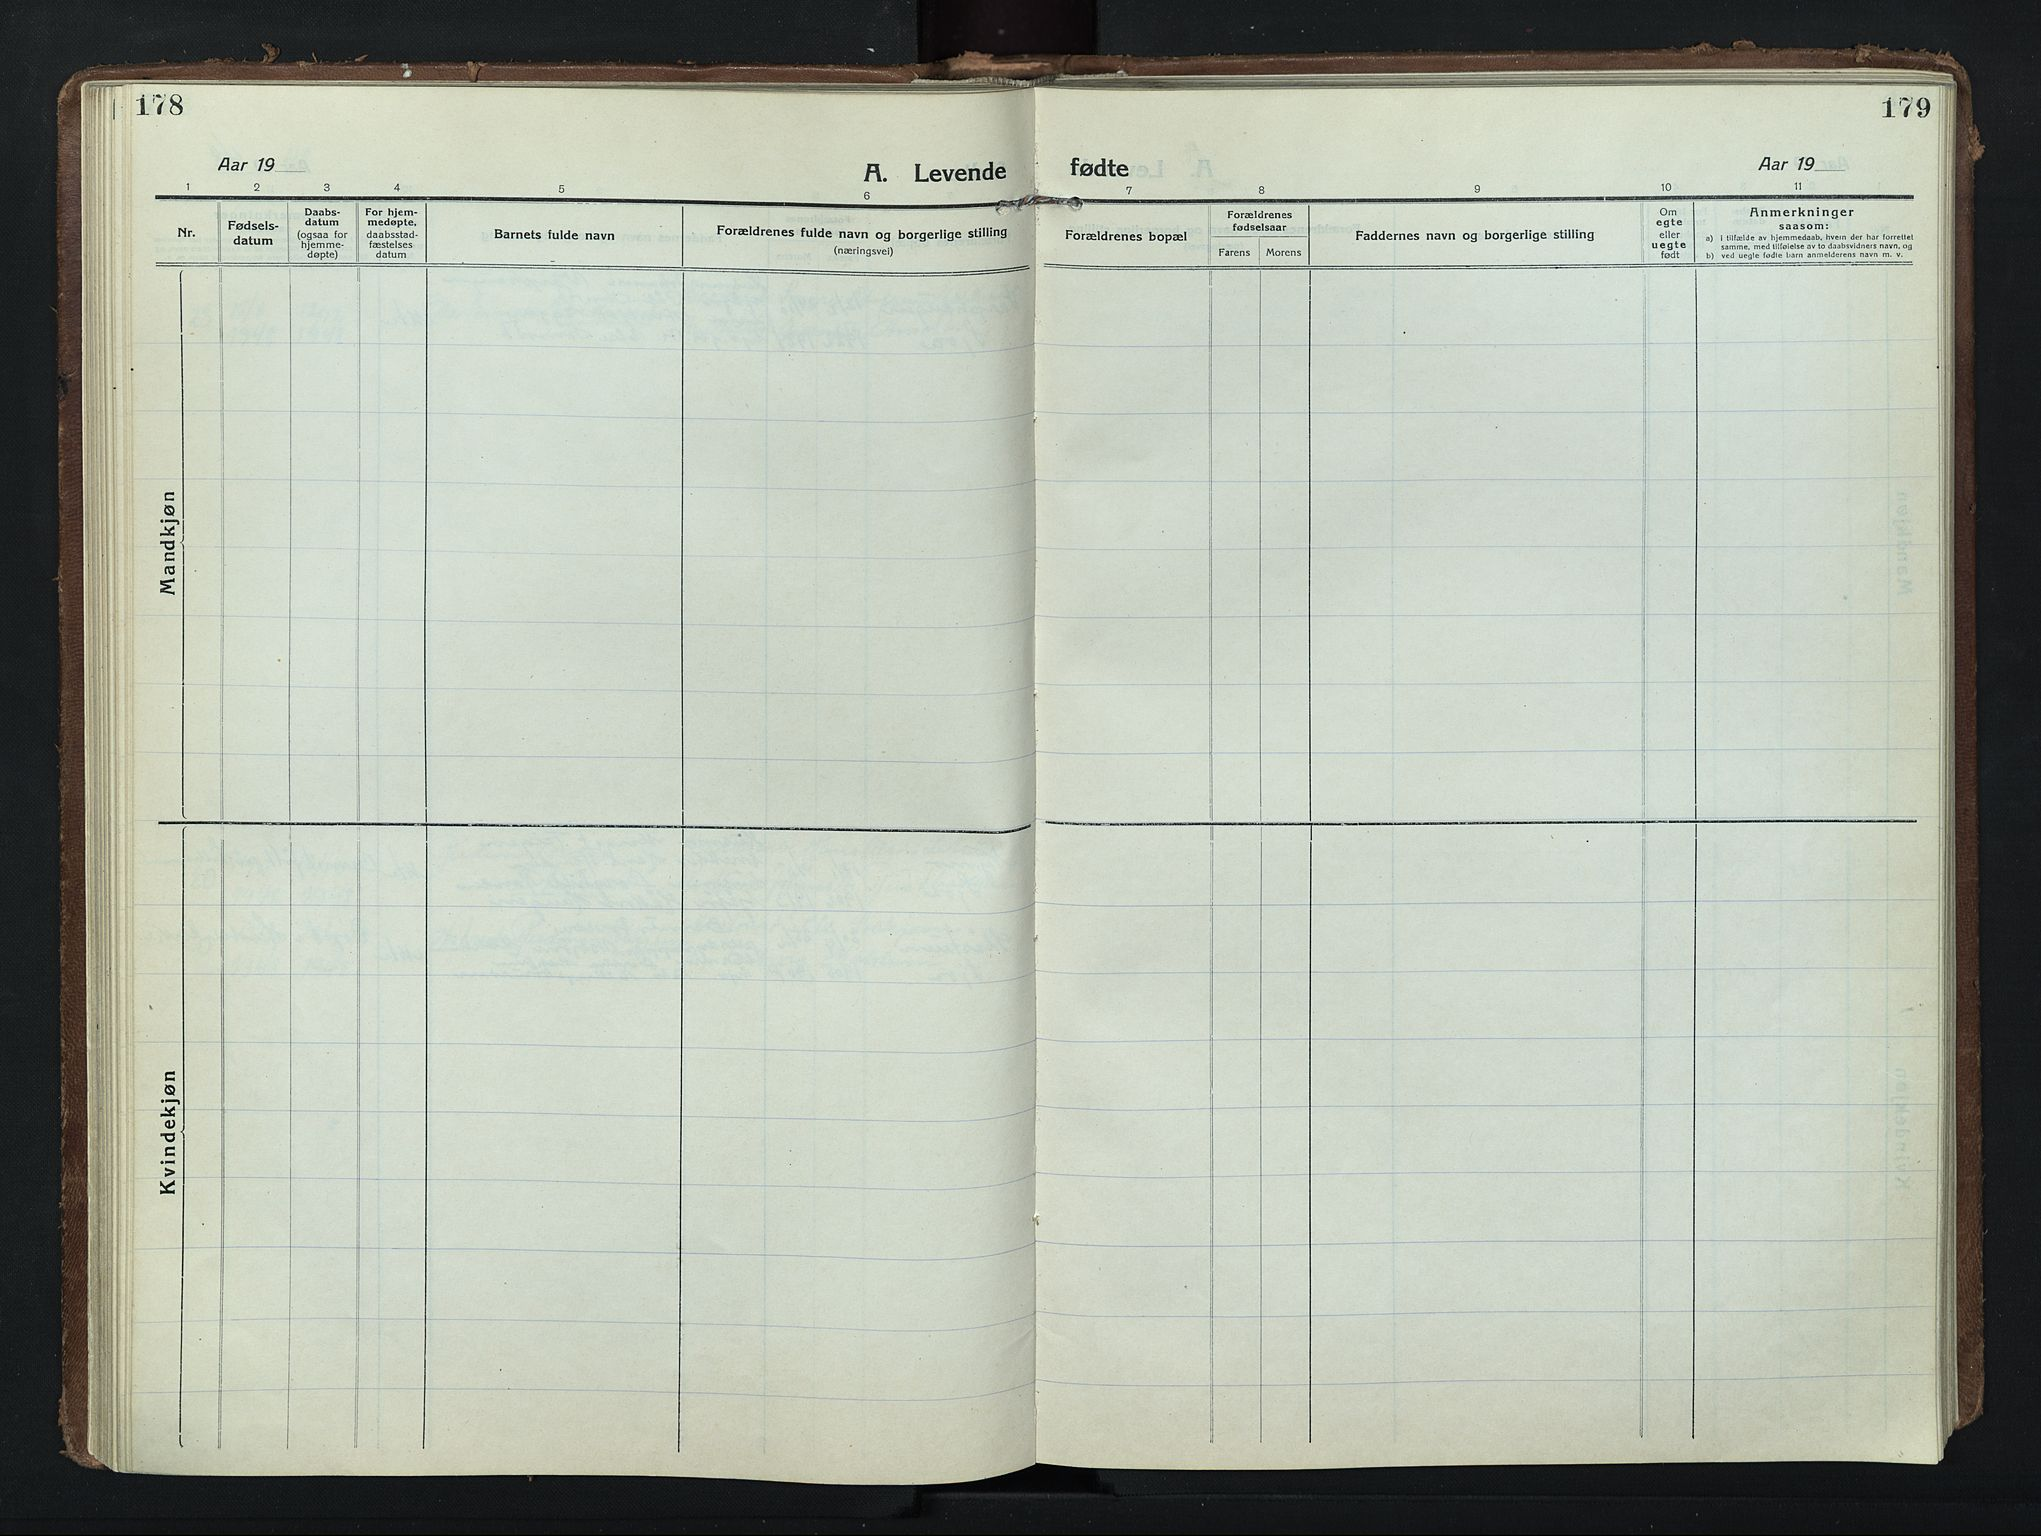 SAH, Nord-Fron prestekontor, Klokkerbok nr. 8, 1915-1948, s. 178-179